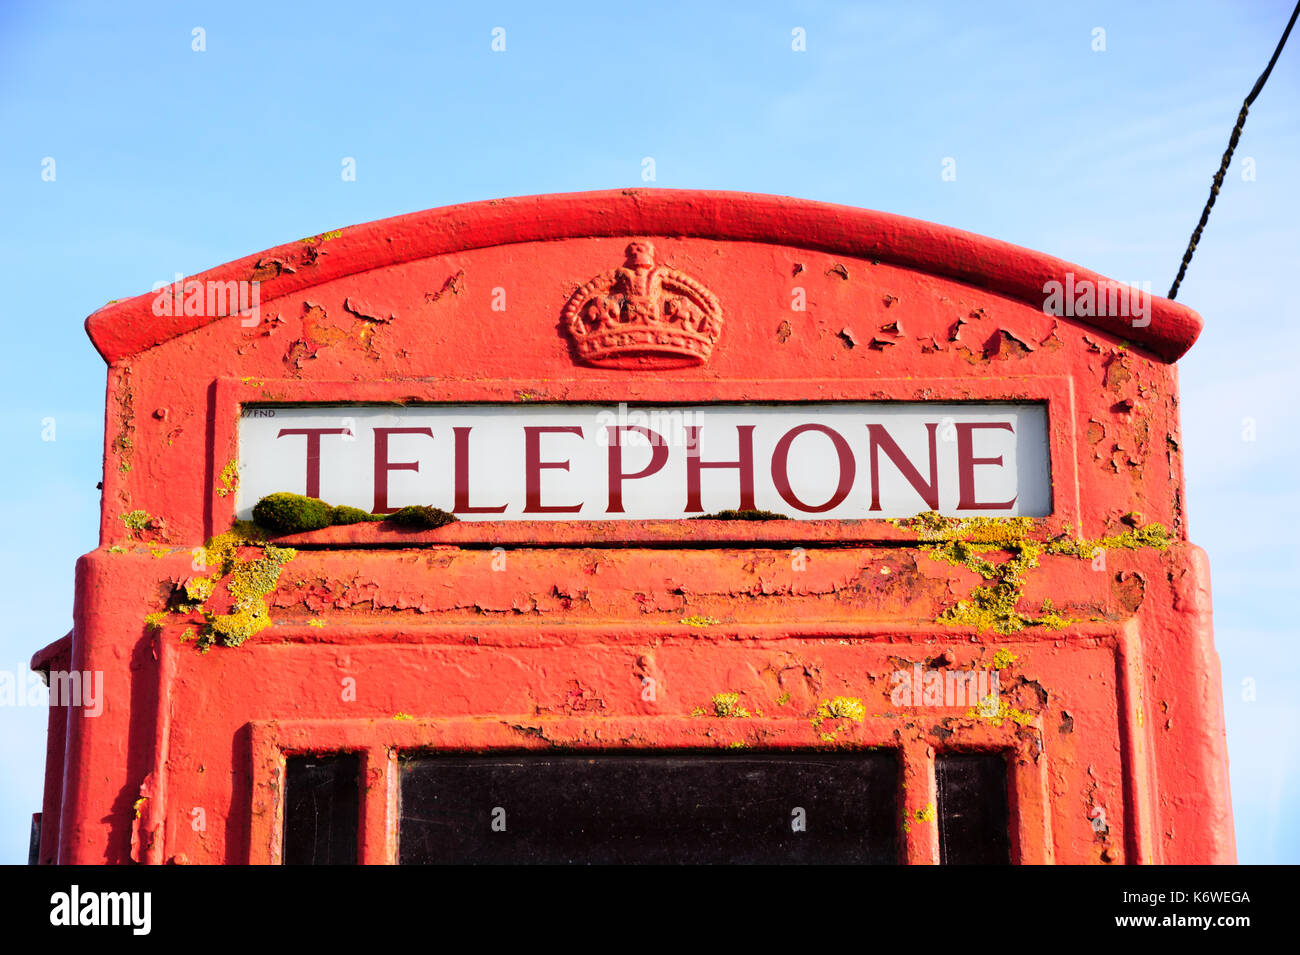 Public red Telephone box. K6 model showing Crown motif. Llansteffan. Wales. - Stock Image